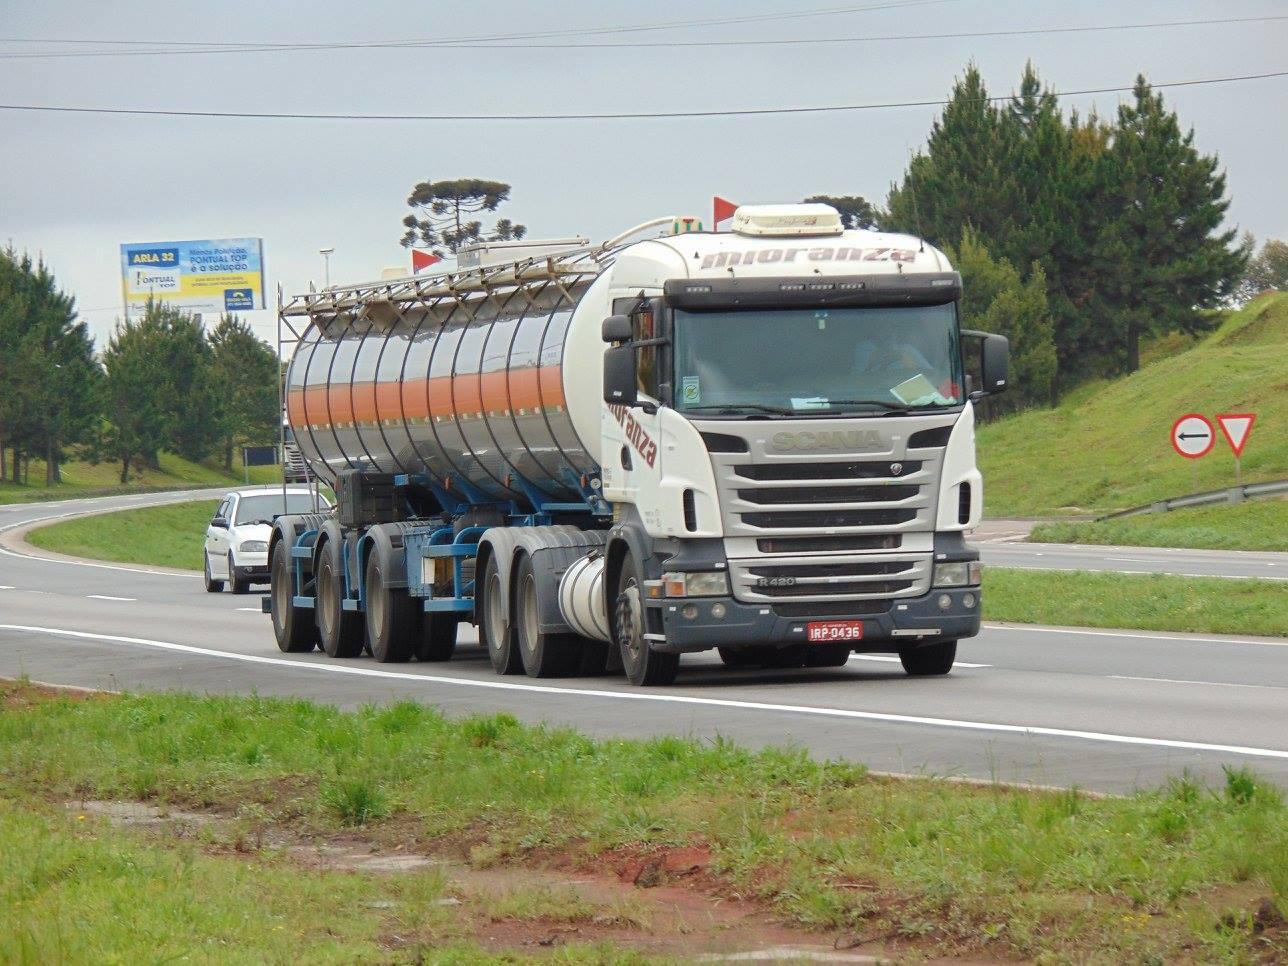 Scania-photo-5-1--2015-8